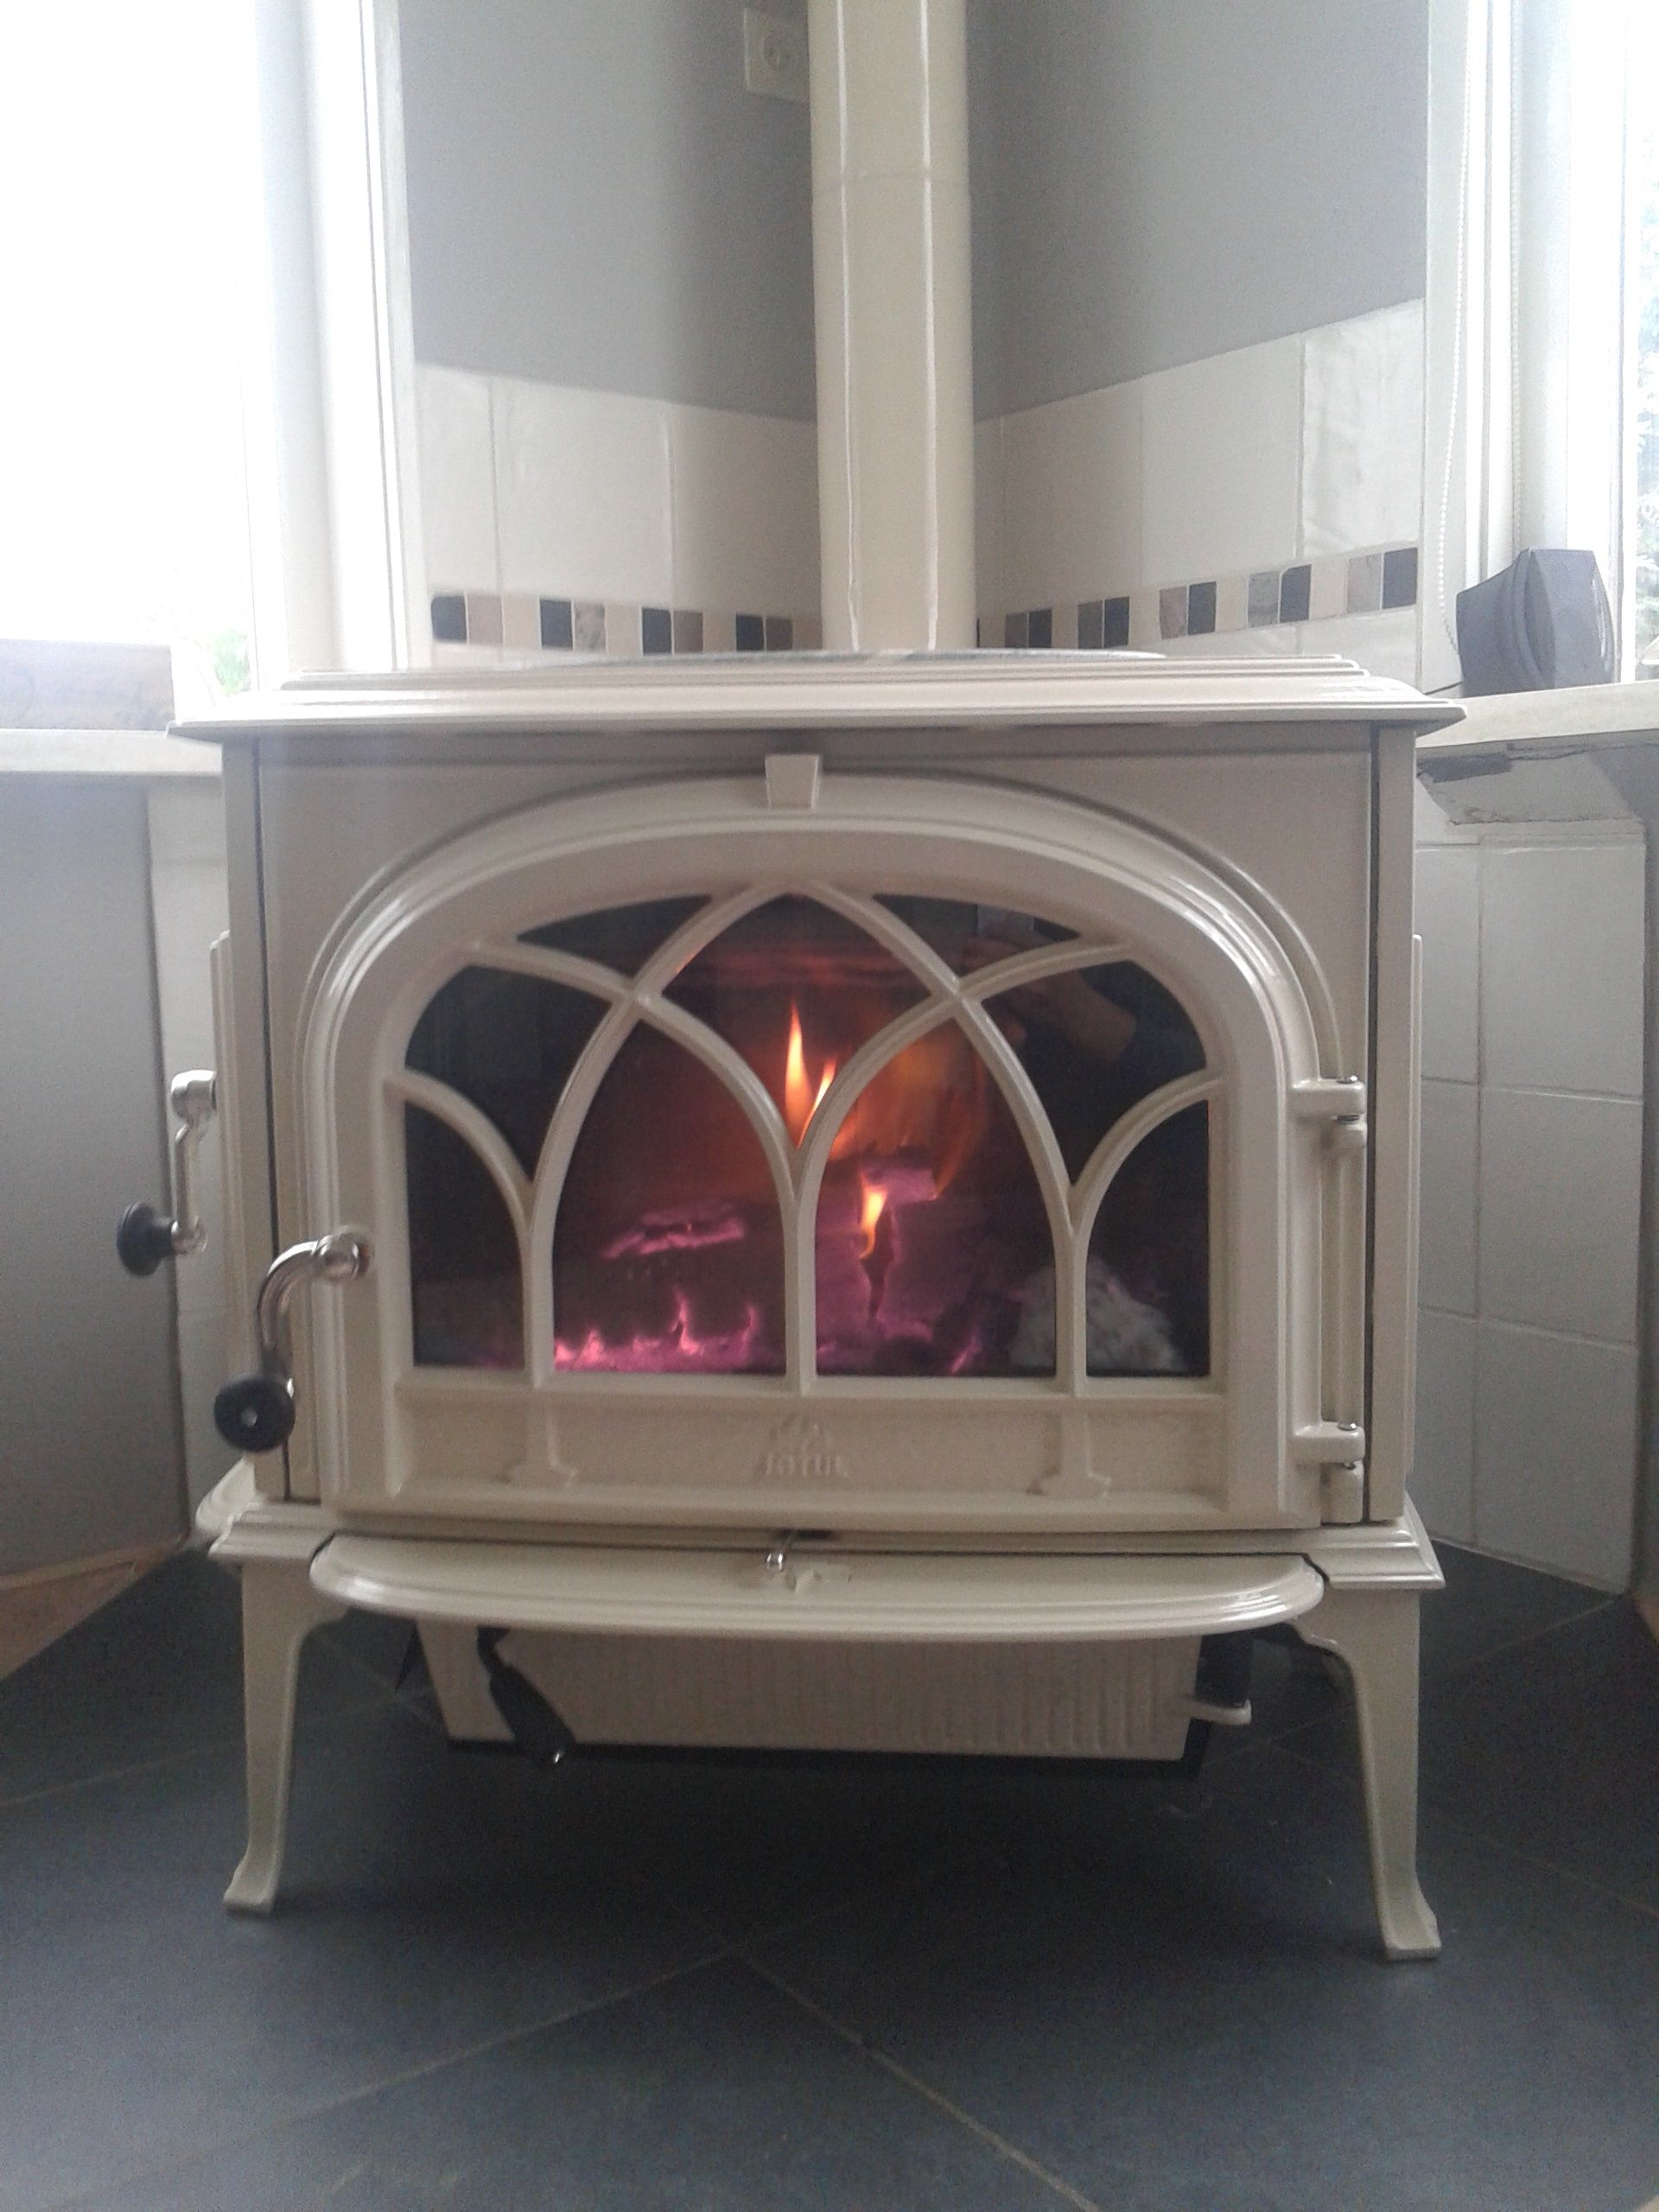 yeoman cl5 balanced flue gas stove fireplace pinterest gas